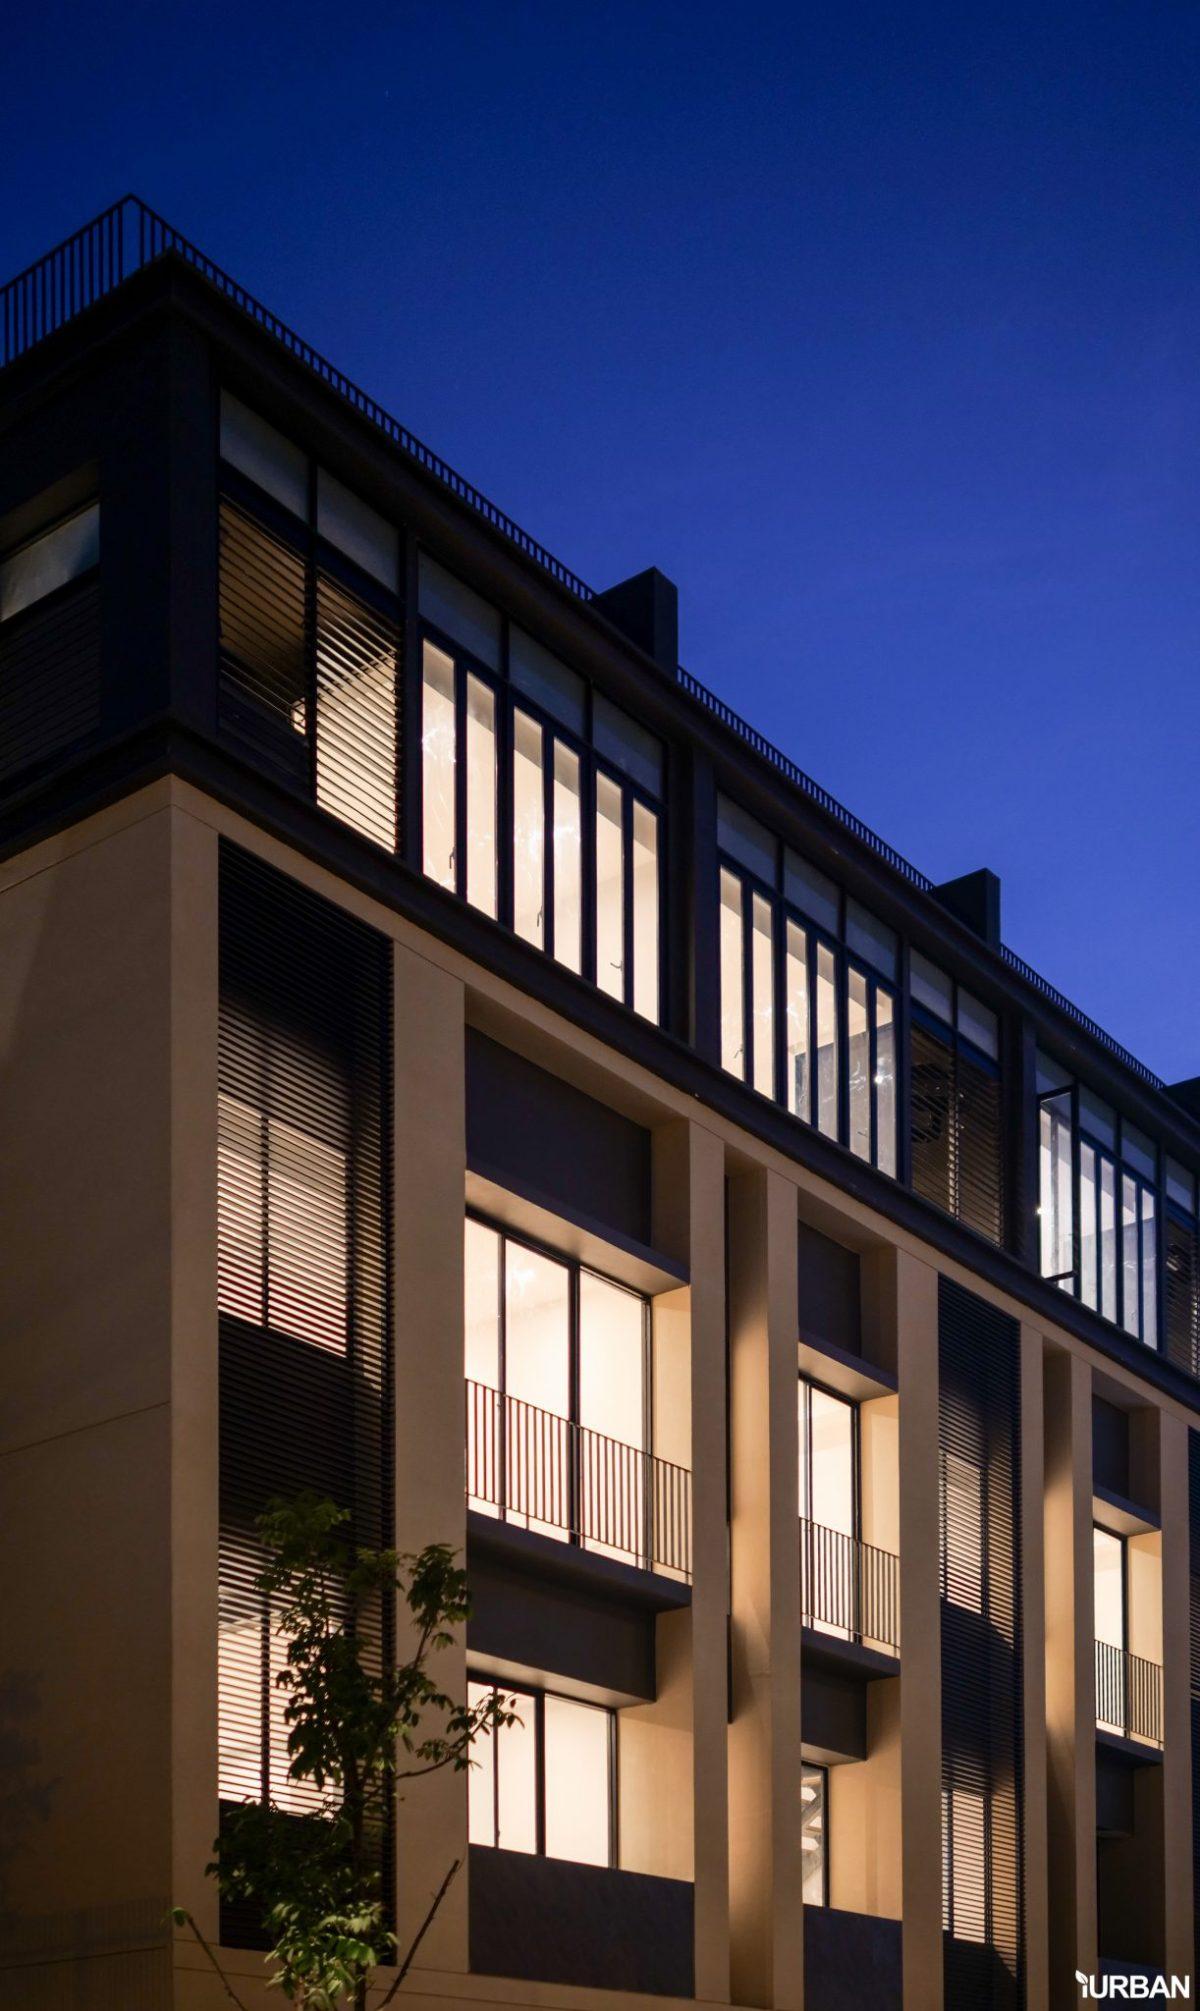 AIRES RAMA9 รีวิว Luxury Townhome 3.5 ชั้น + Rooftop ออกแบบสวย ย่านพระราม9 (ใกล้ รพ.สมิติเวช) 20 - AIRES